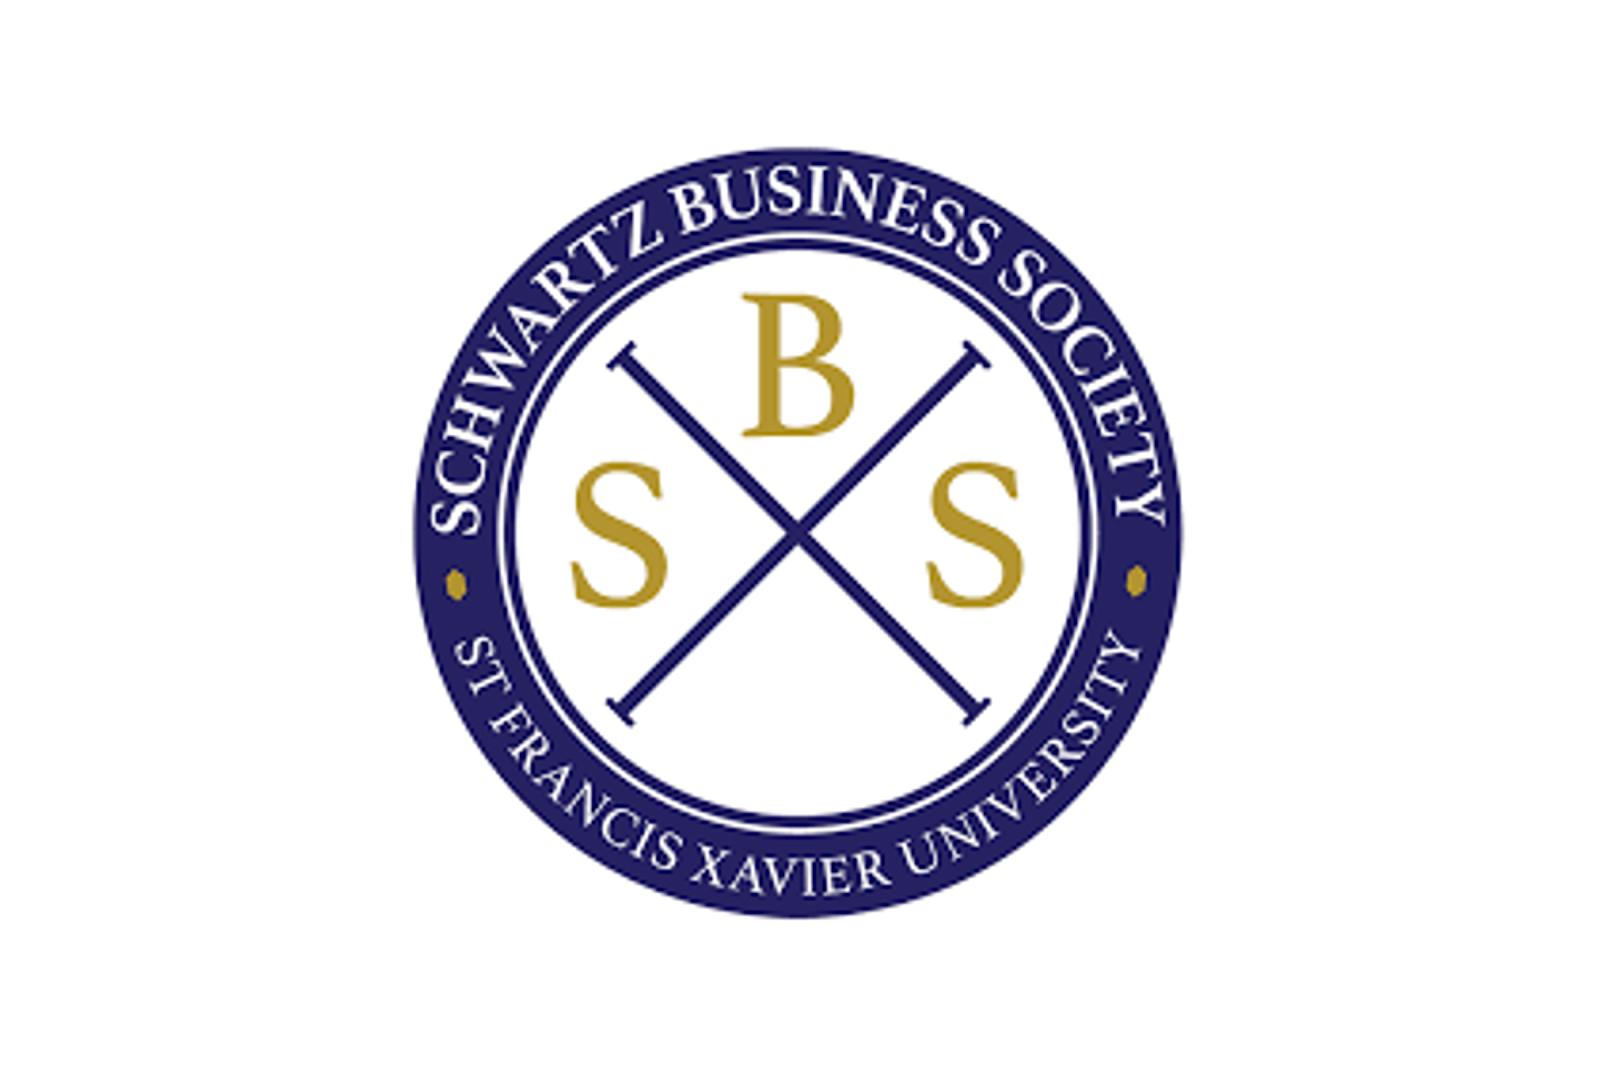 St. Francis Xavier University | Schwartz School of Business